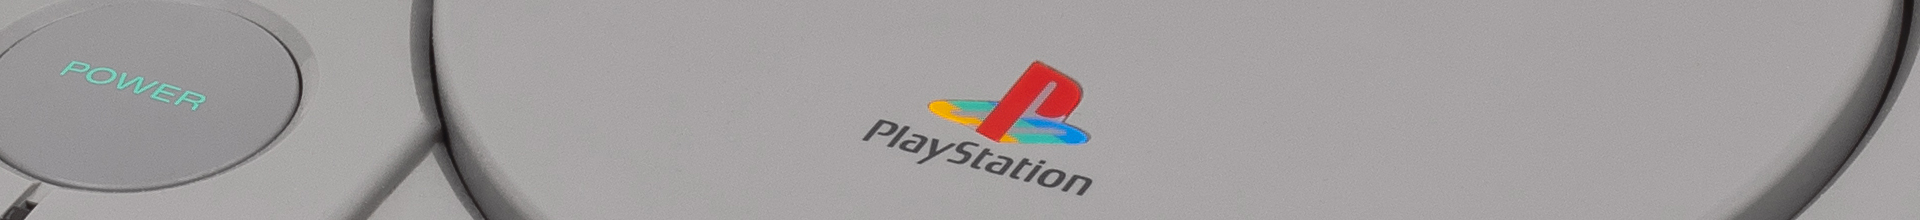 1994 PlayStation